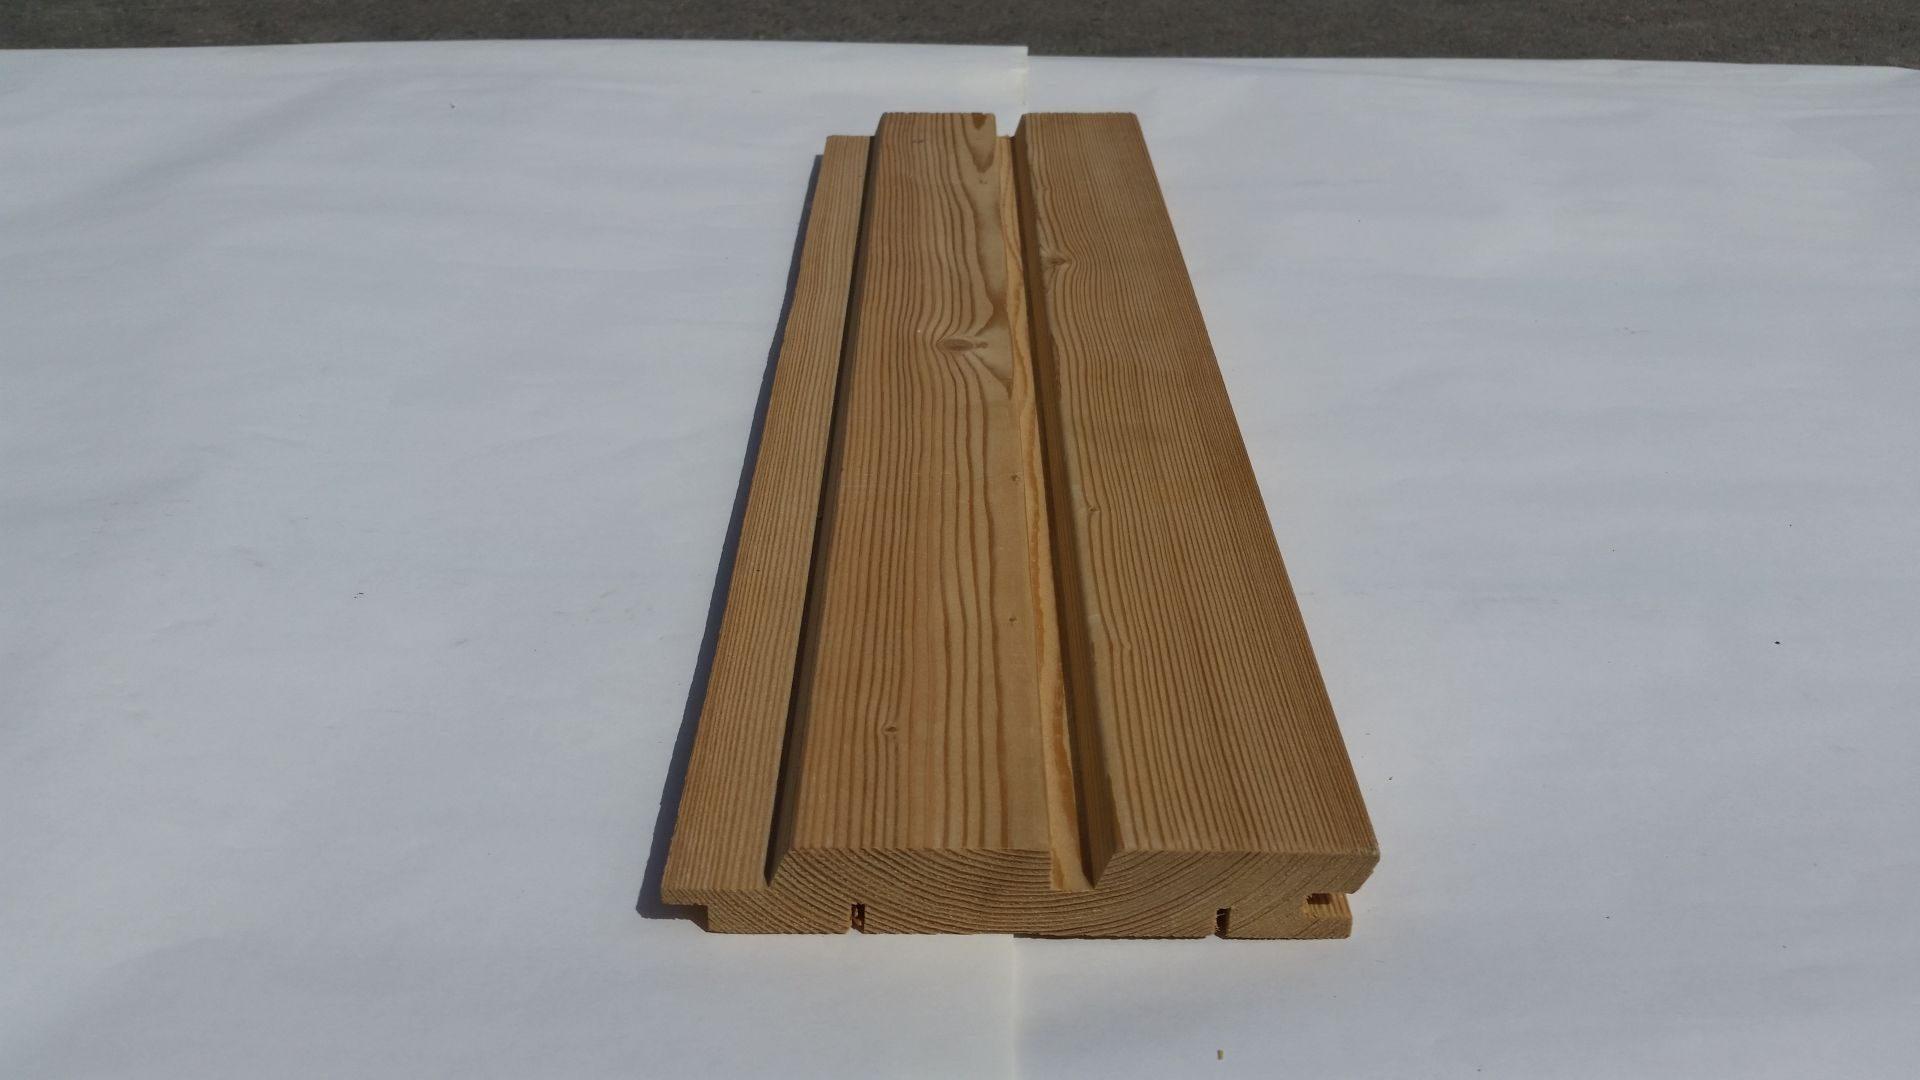 sibirski-macesen-lesene-terase-lesene-fasade-pd-les.si-103